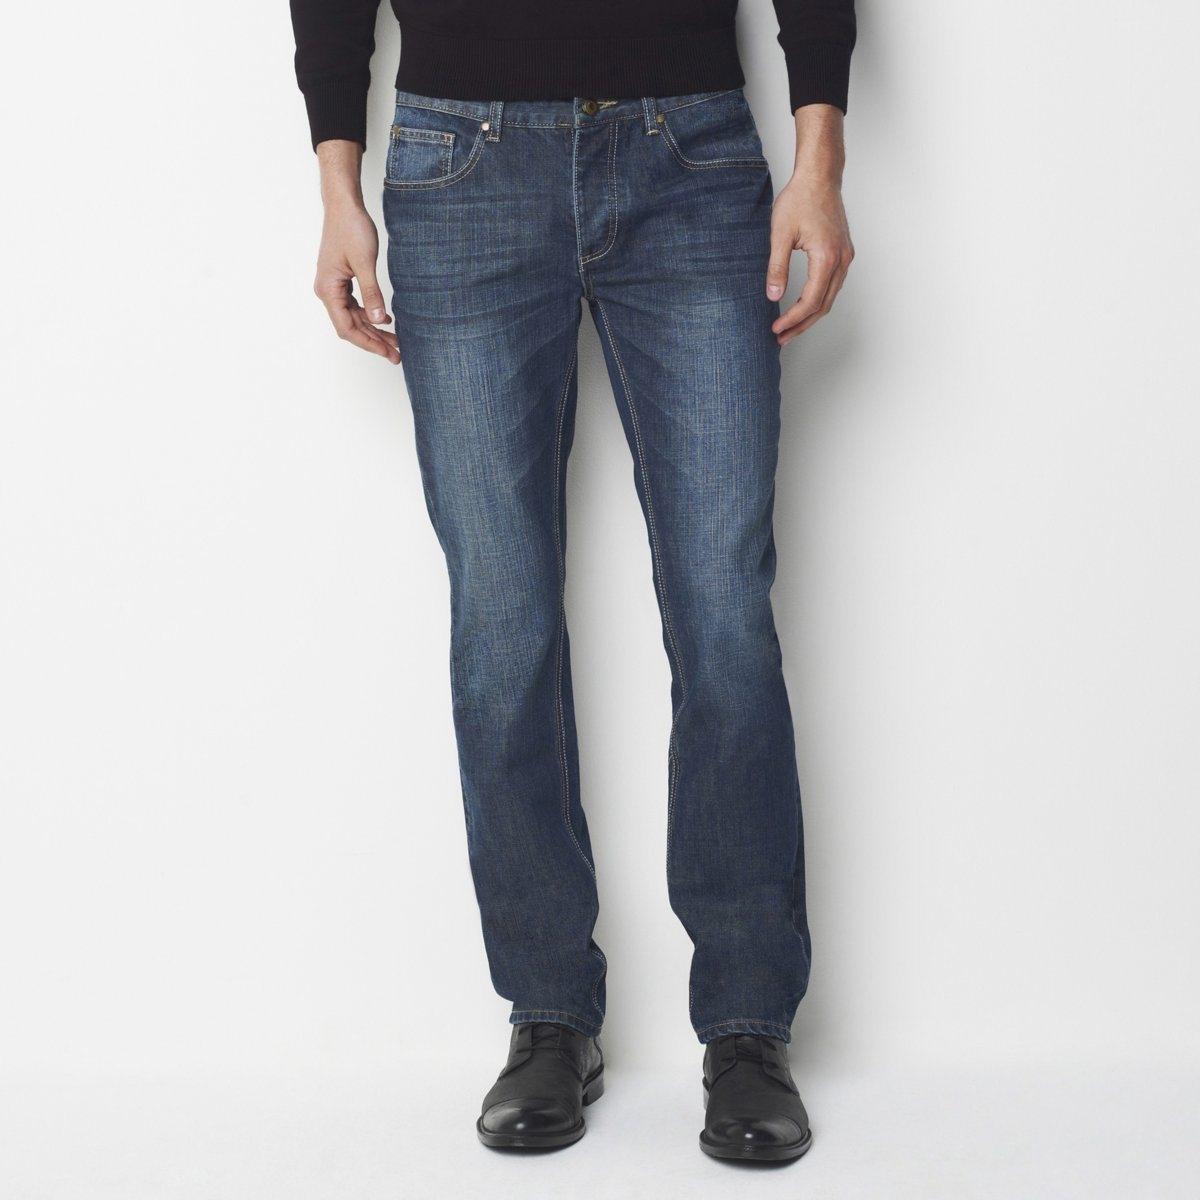 Straight-Fit-Jeans| Länge 34 | Bekleidung > Jeans > Straight Leg Jeans | Grau | Jeans - Denim | La Redoute Collections